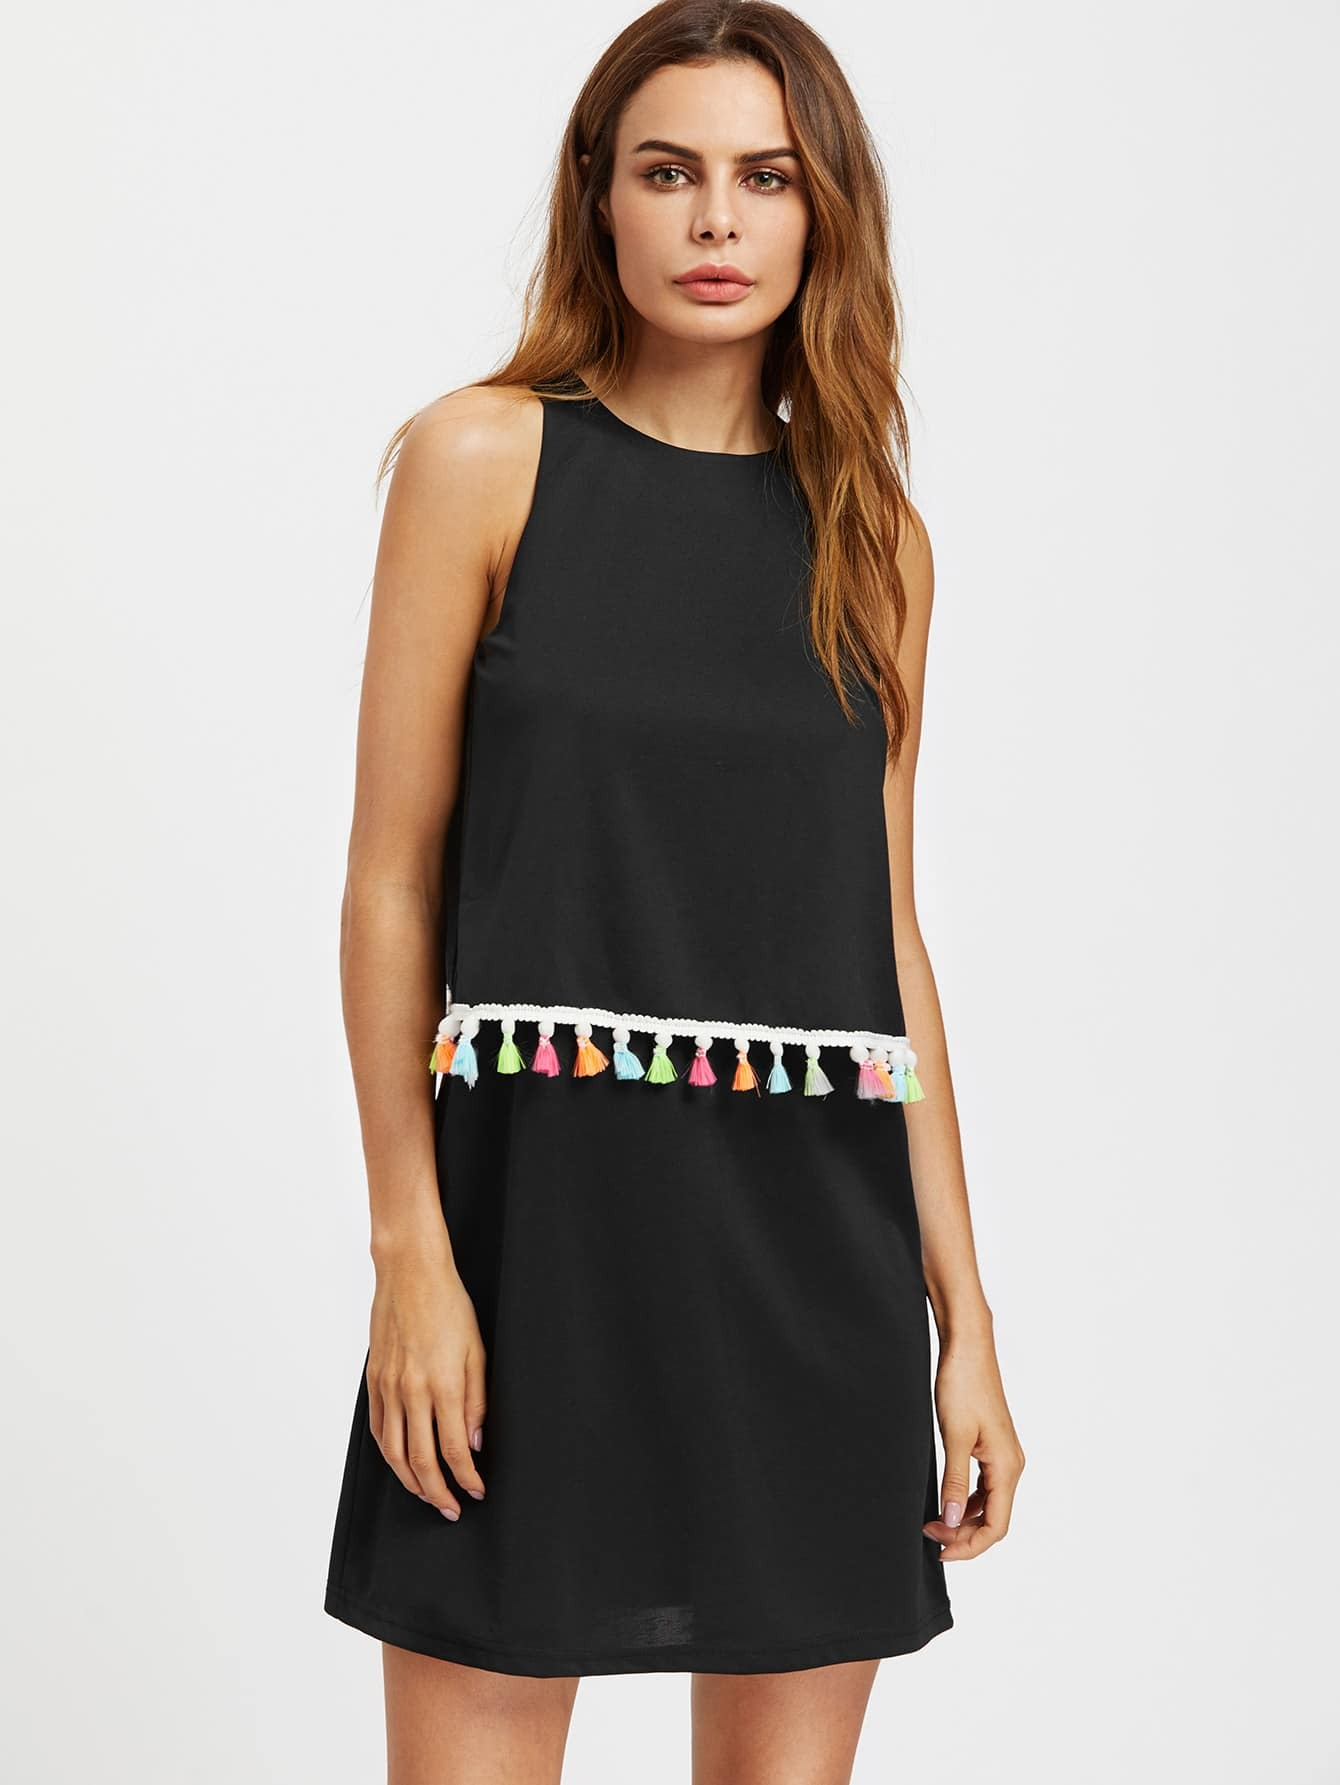 Фото Tassel Trim Overlap Back Two Layer Dress. Купить с доставкой